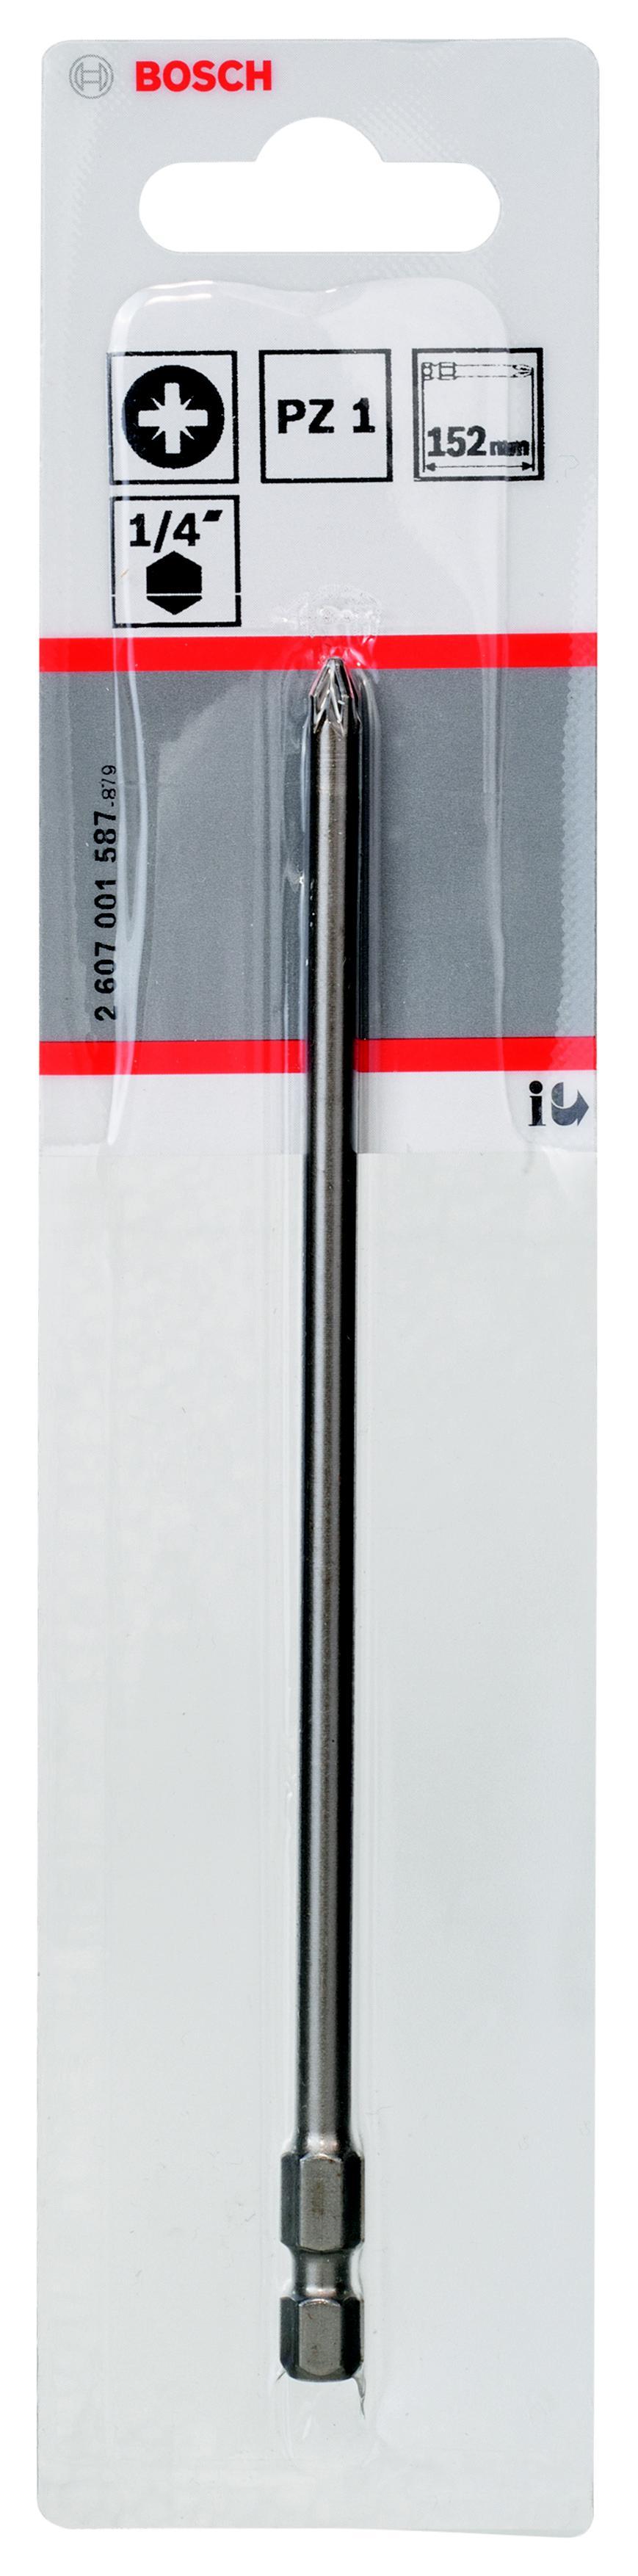 Бита Bosch Extra-hart pz1 152 мм, 1 шт. (2.607.001.587) набор бит bosch ph pz tx sl 12шт extra hart 2 608 255 994